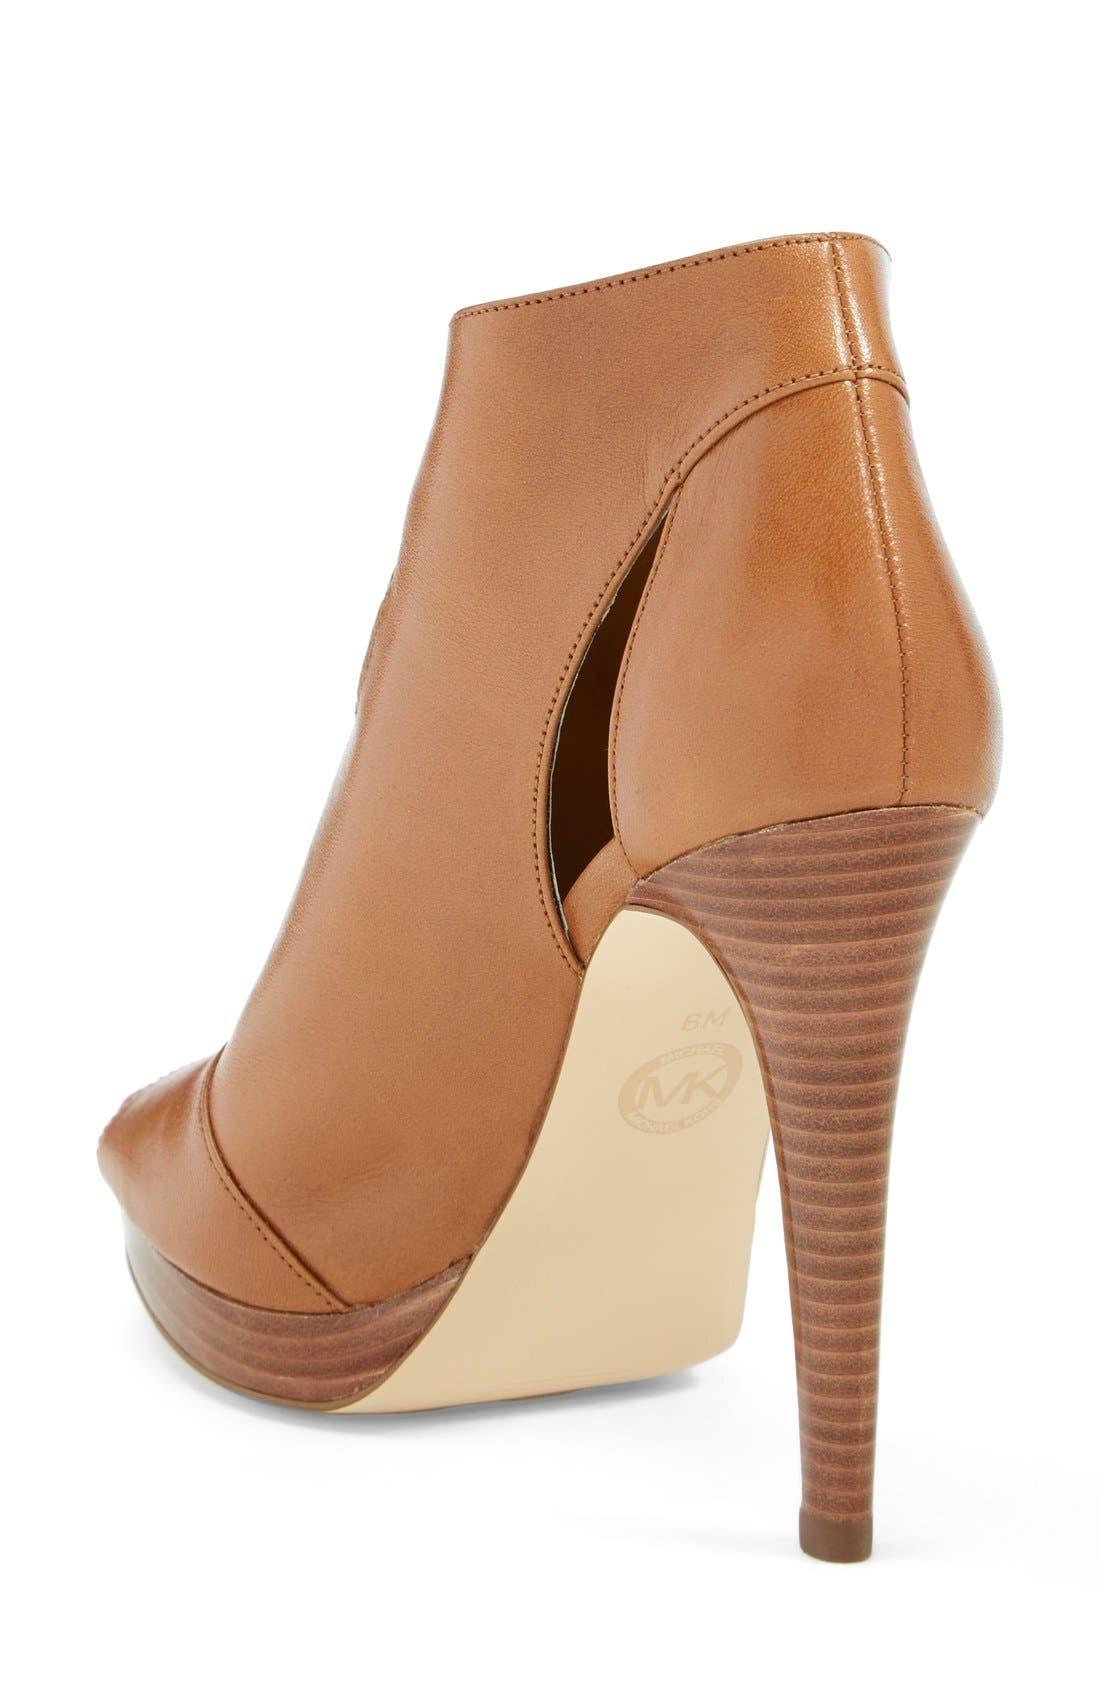 Alternate Image 2  - MICHAEL Michael Kors 'Isabella' Leather Peep Toe Bootie (Women)